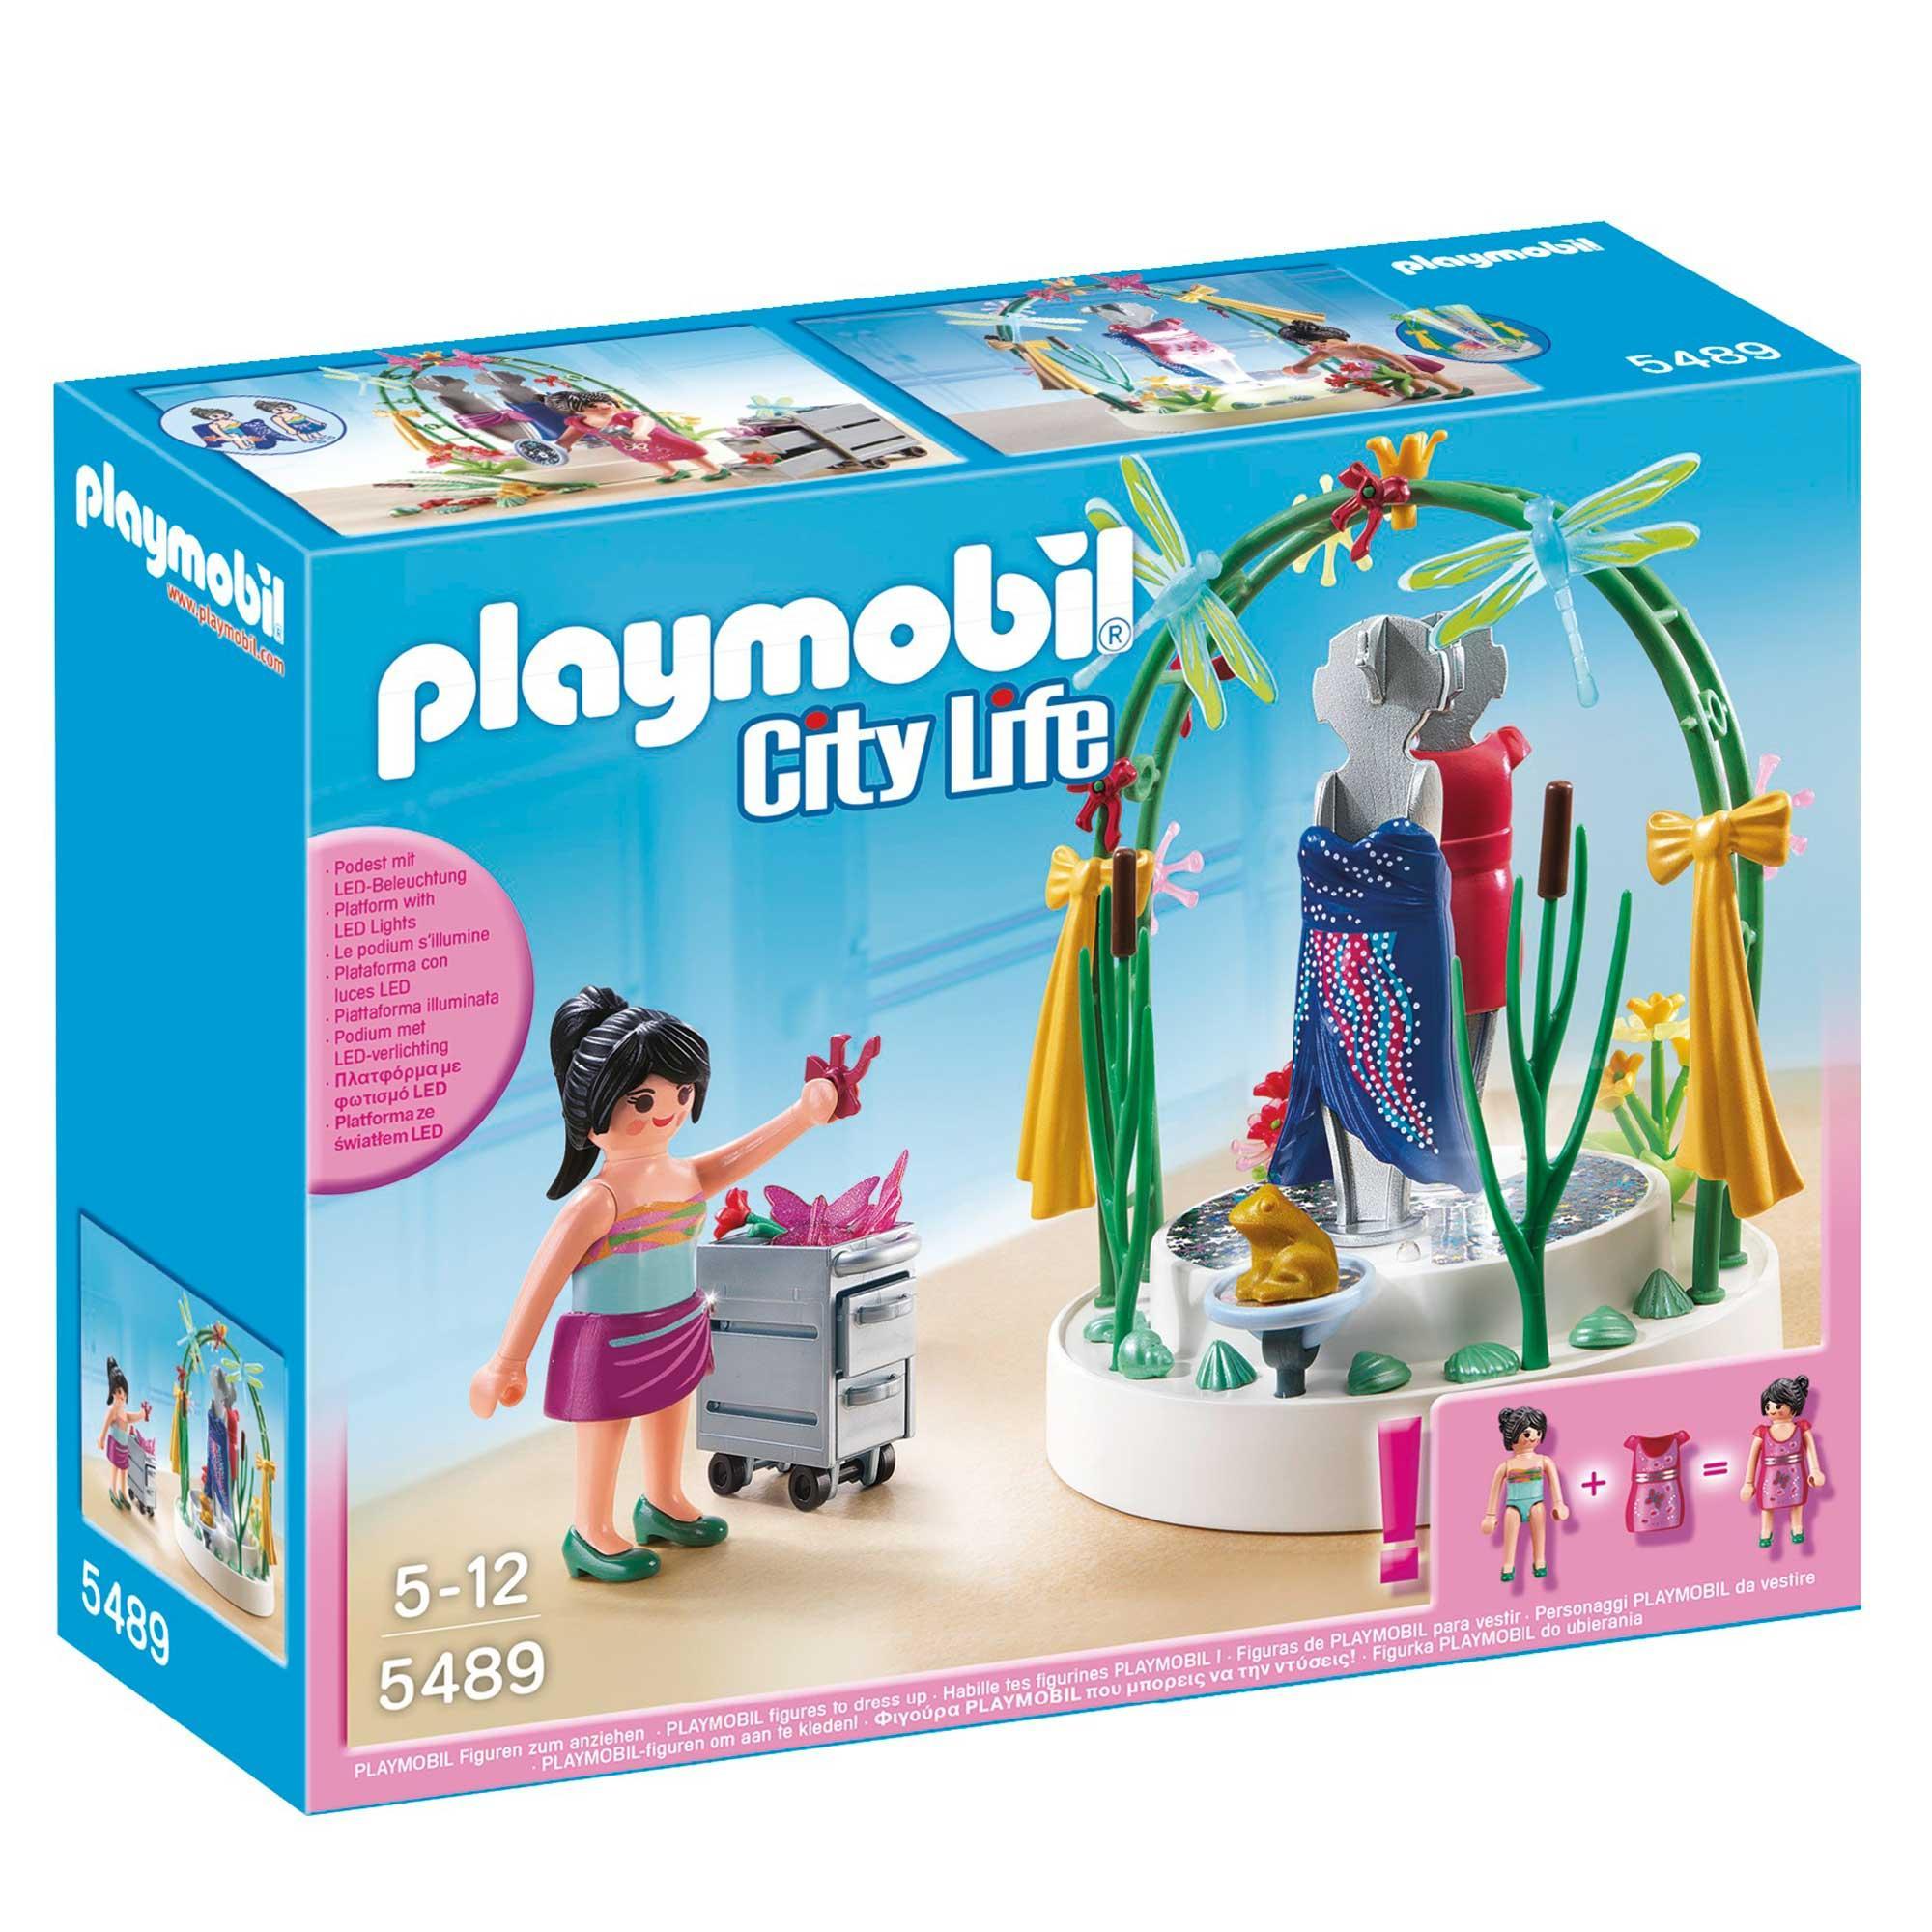 Playmobil city life maxi toys